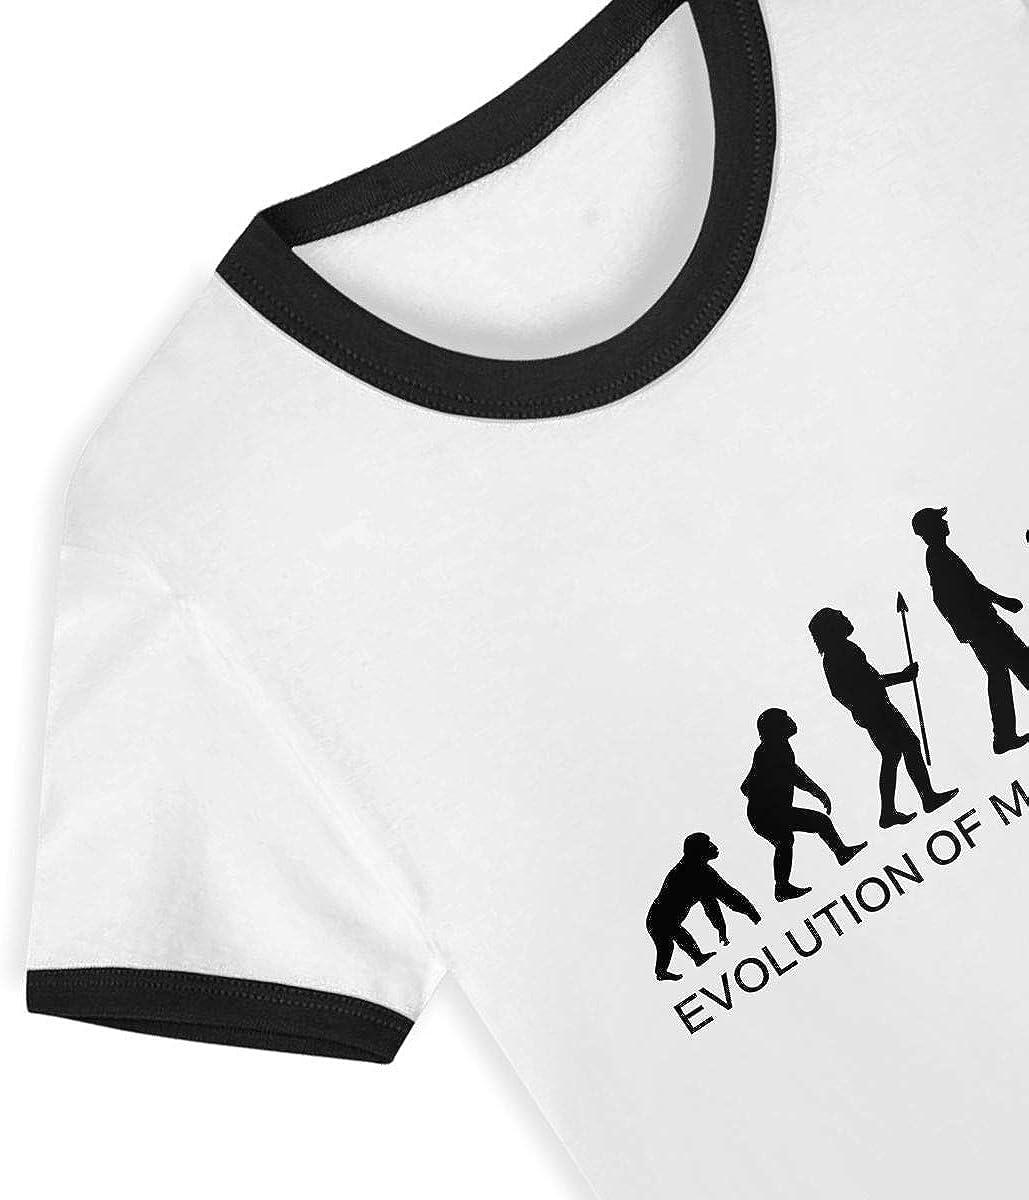 CY SHOP Evolution of Man Computer Childrens Boys Girls Contrast Short Sleeve T-Shirt